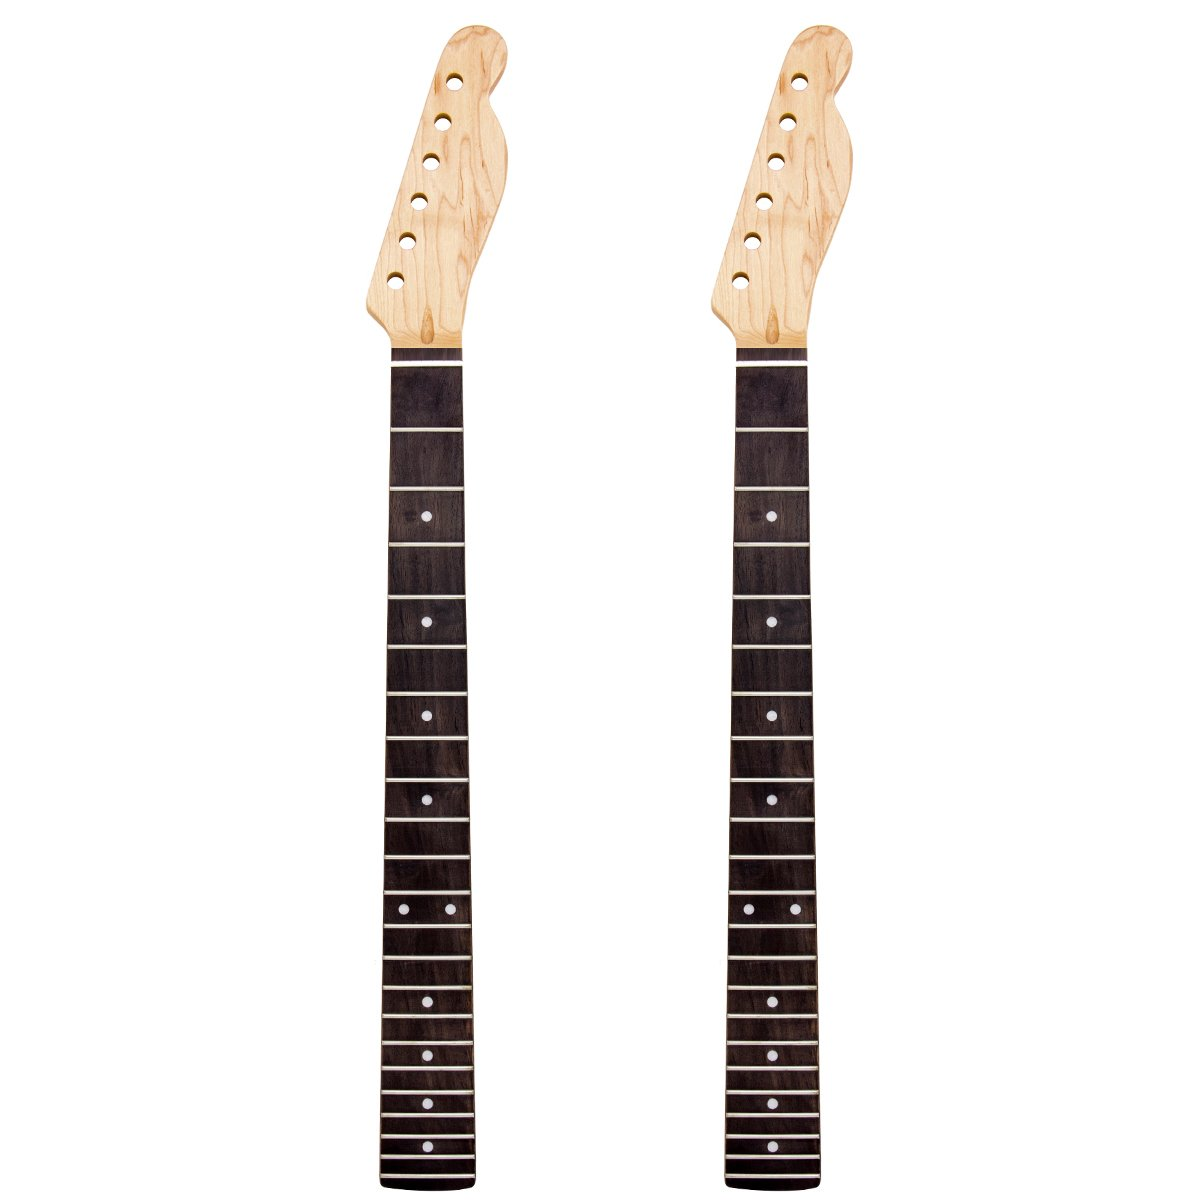 2pcs Matt Electric Guitar Neck 22 Frets Rosewood Fretboard Replacement